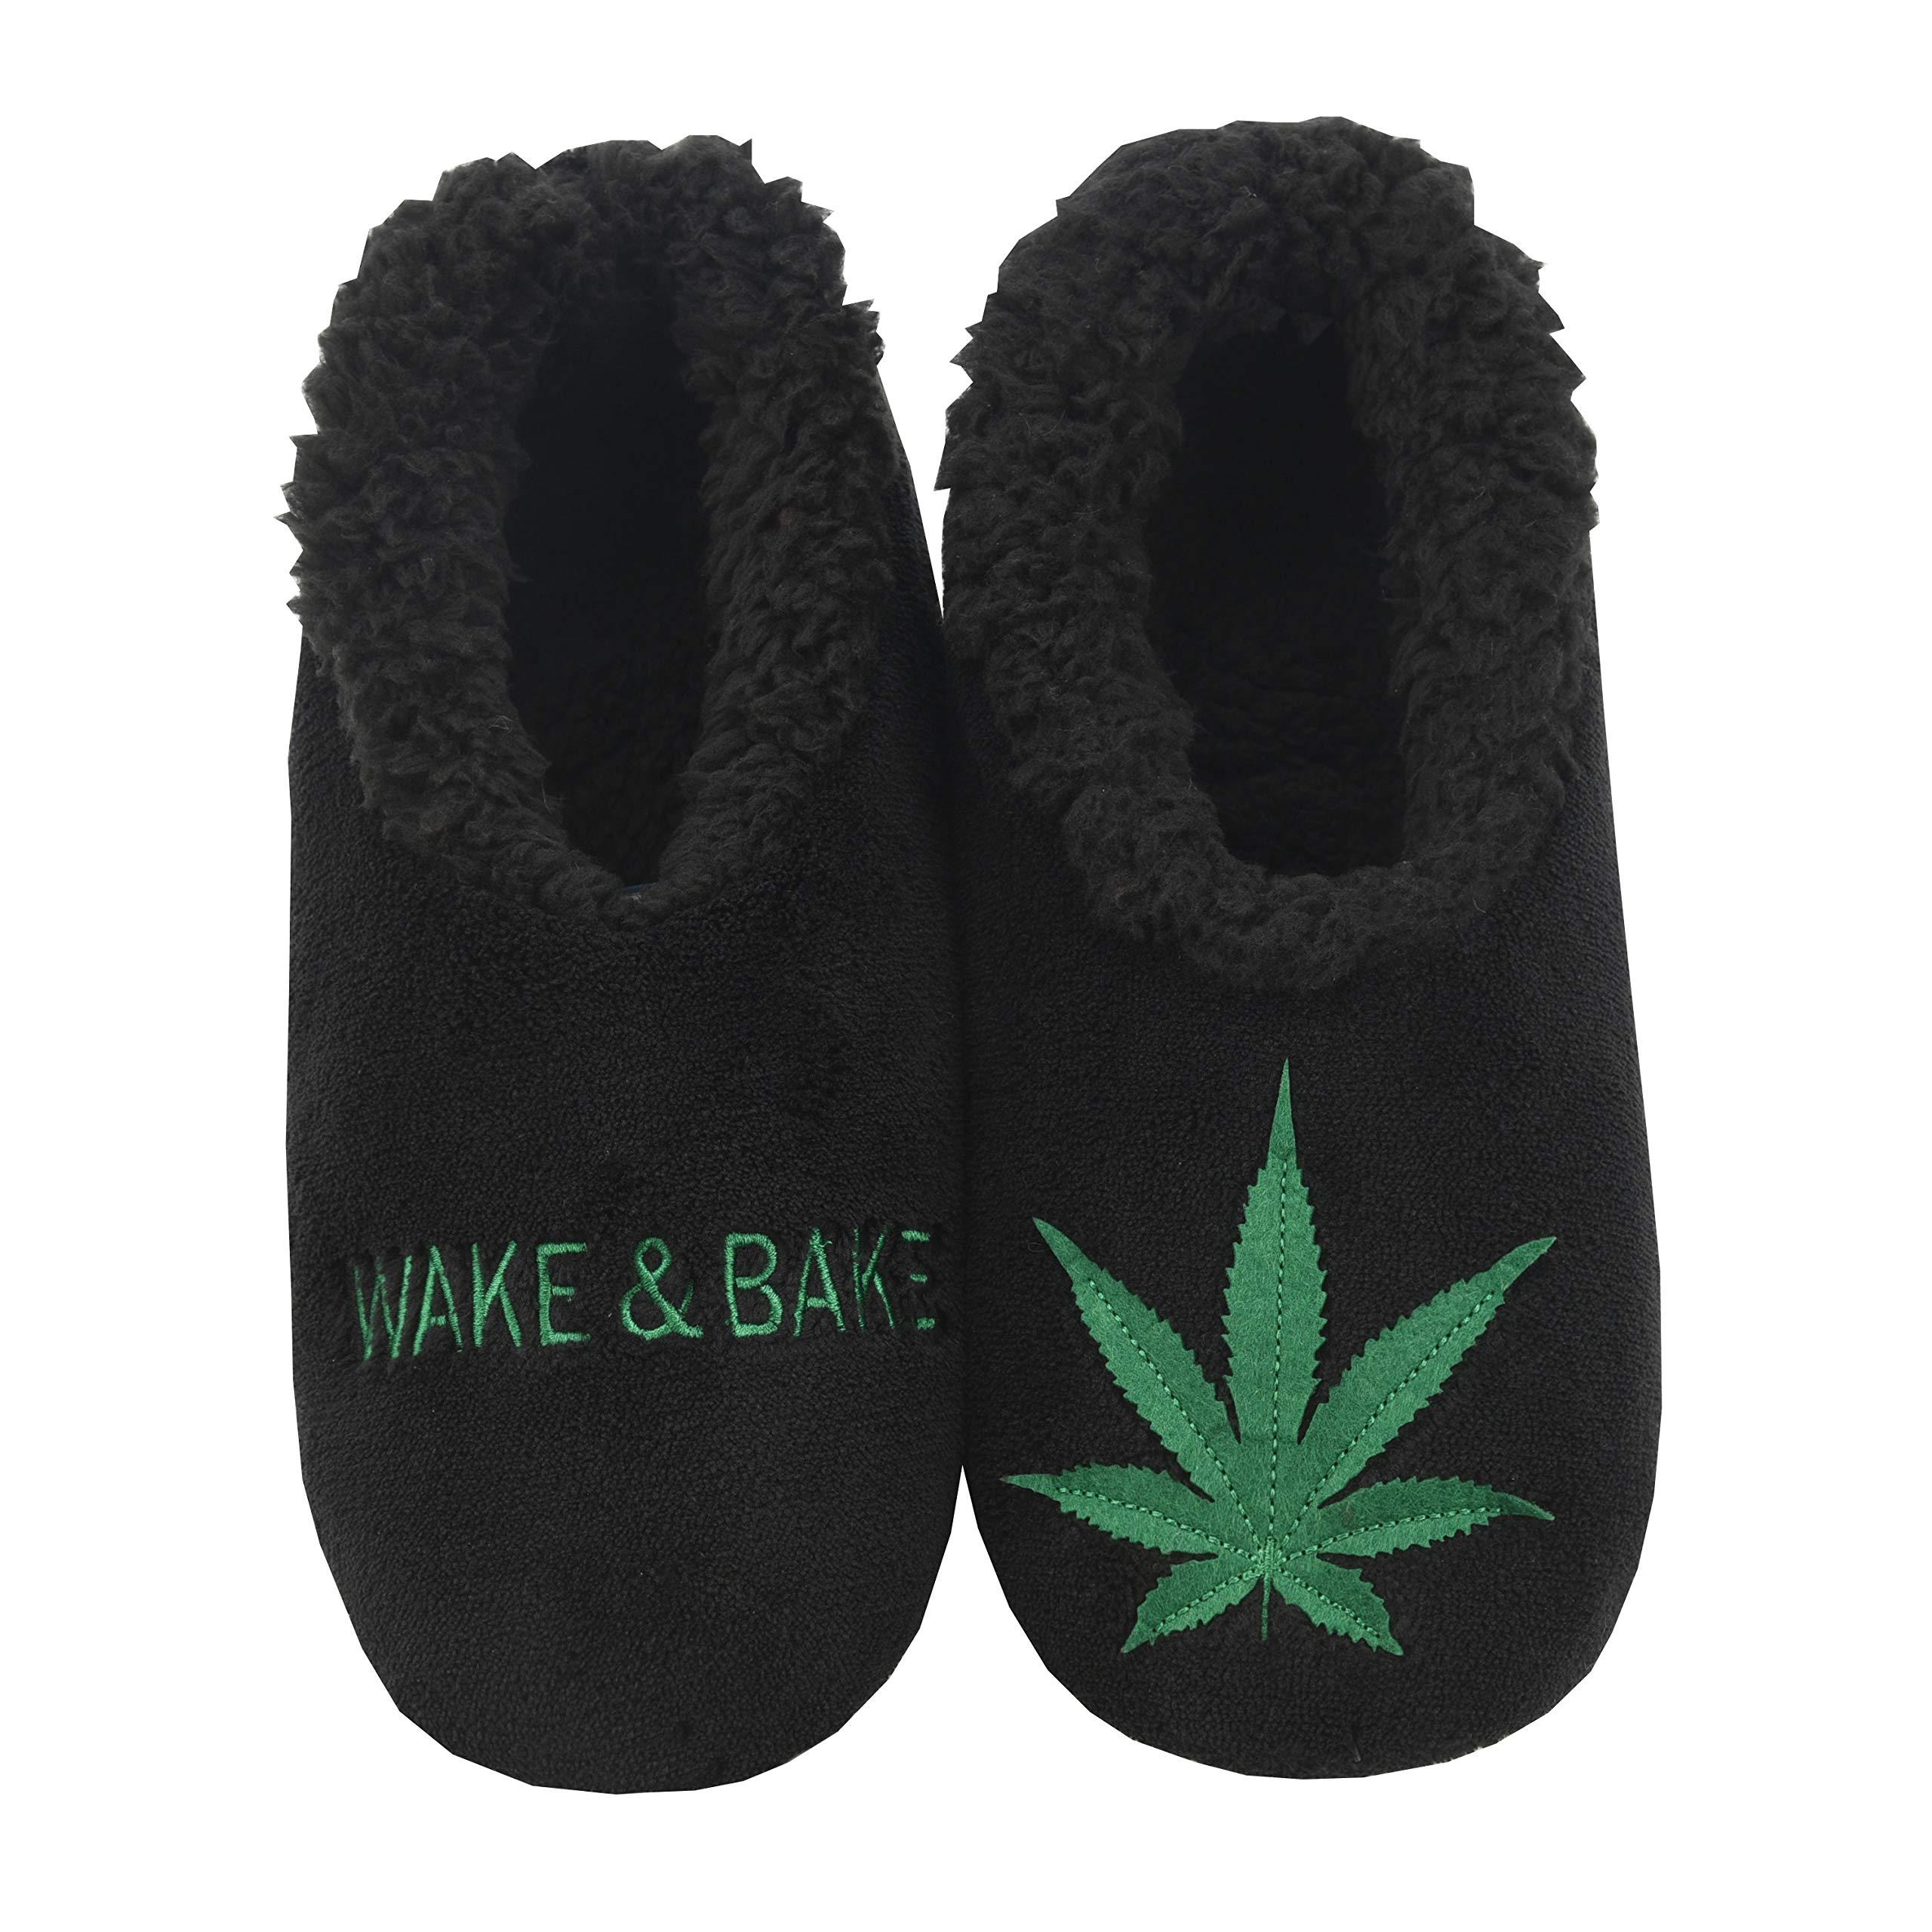 Snoozies 420 Mens Slippers | Slippers for Men | Wake & Bake | Large